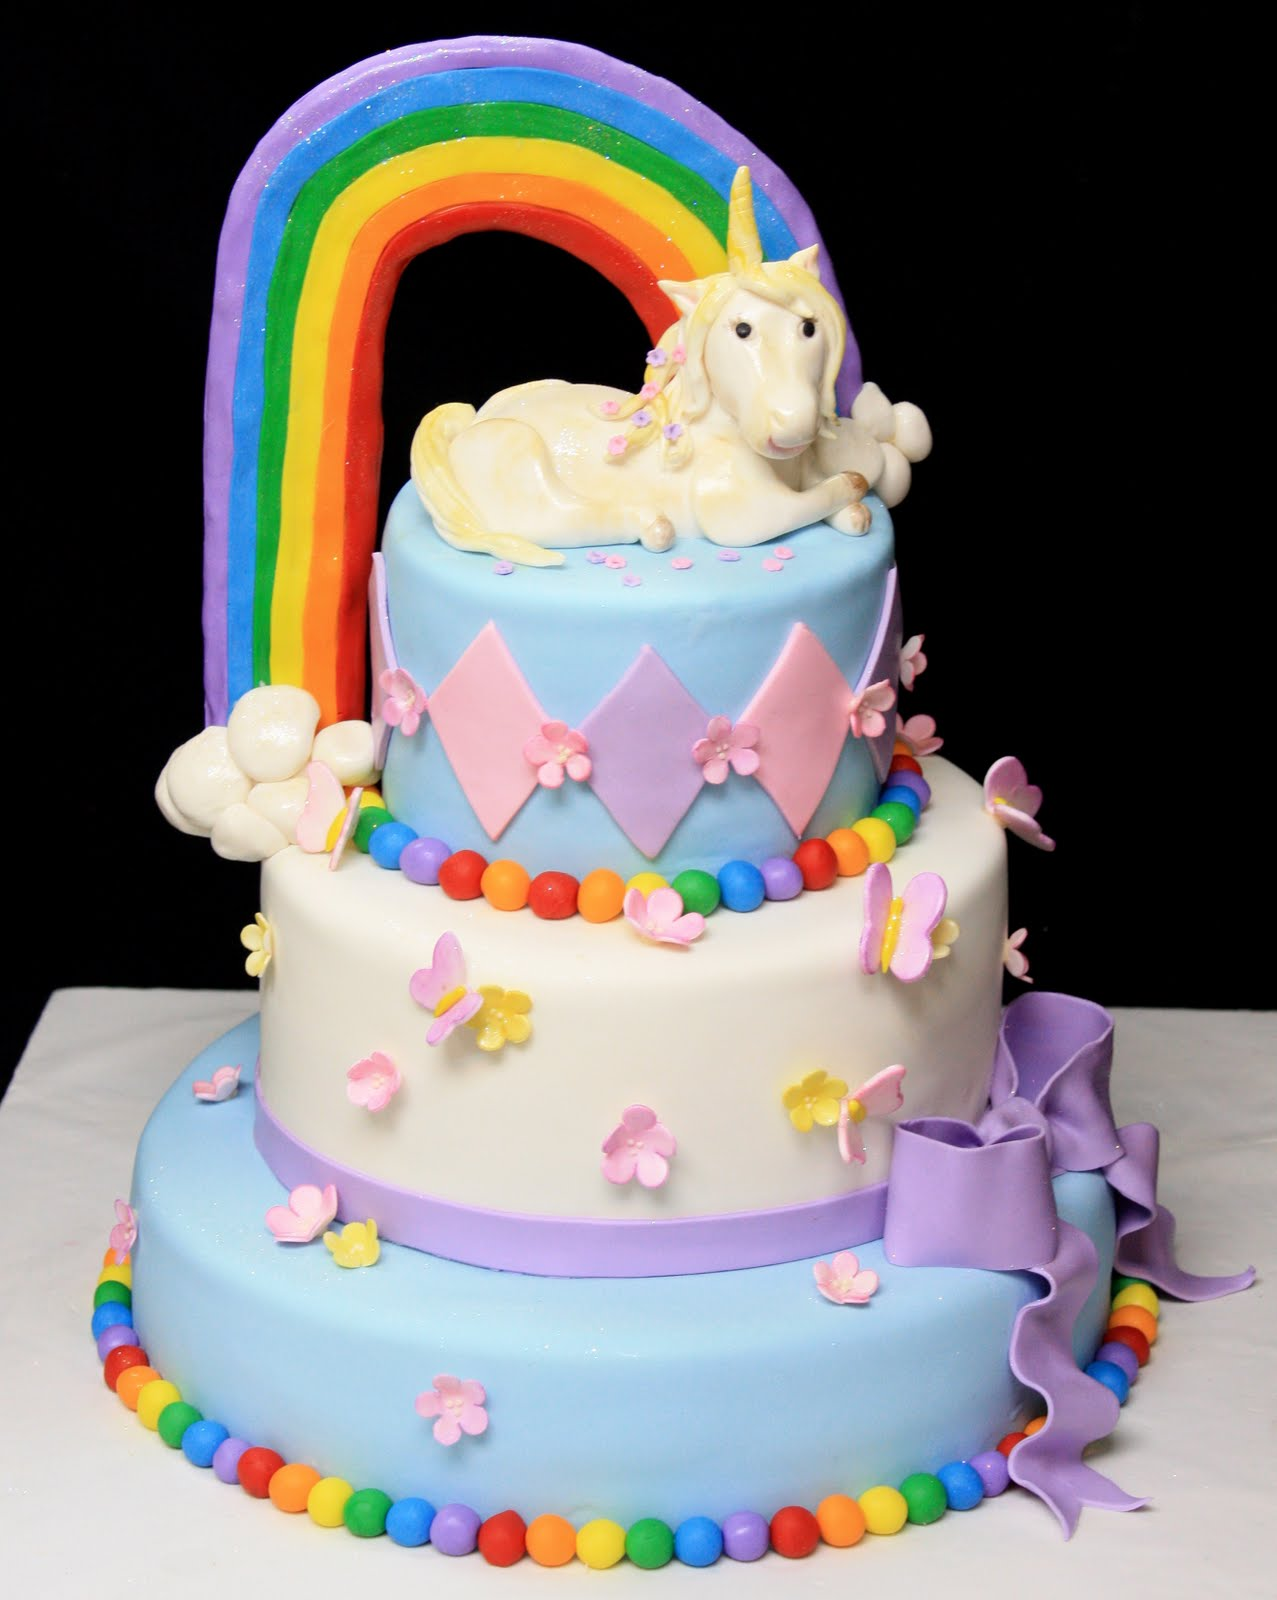 Enjoyable Unicorn Cakes Decoration Ideas Little Birthday Cakes Funny Birthday Cards Online Unhofree Goldxyz